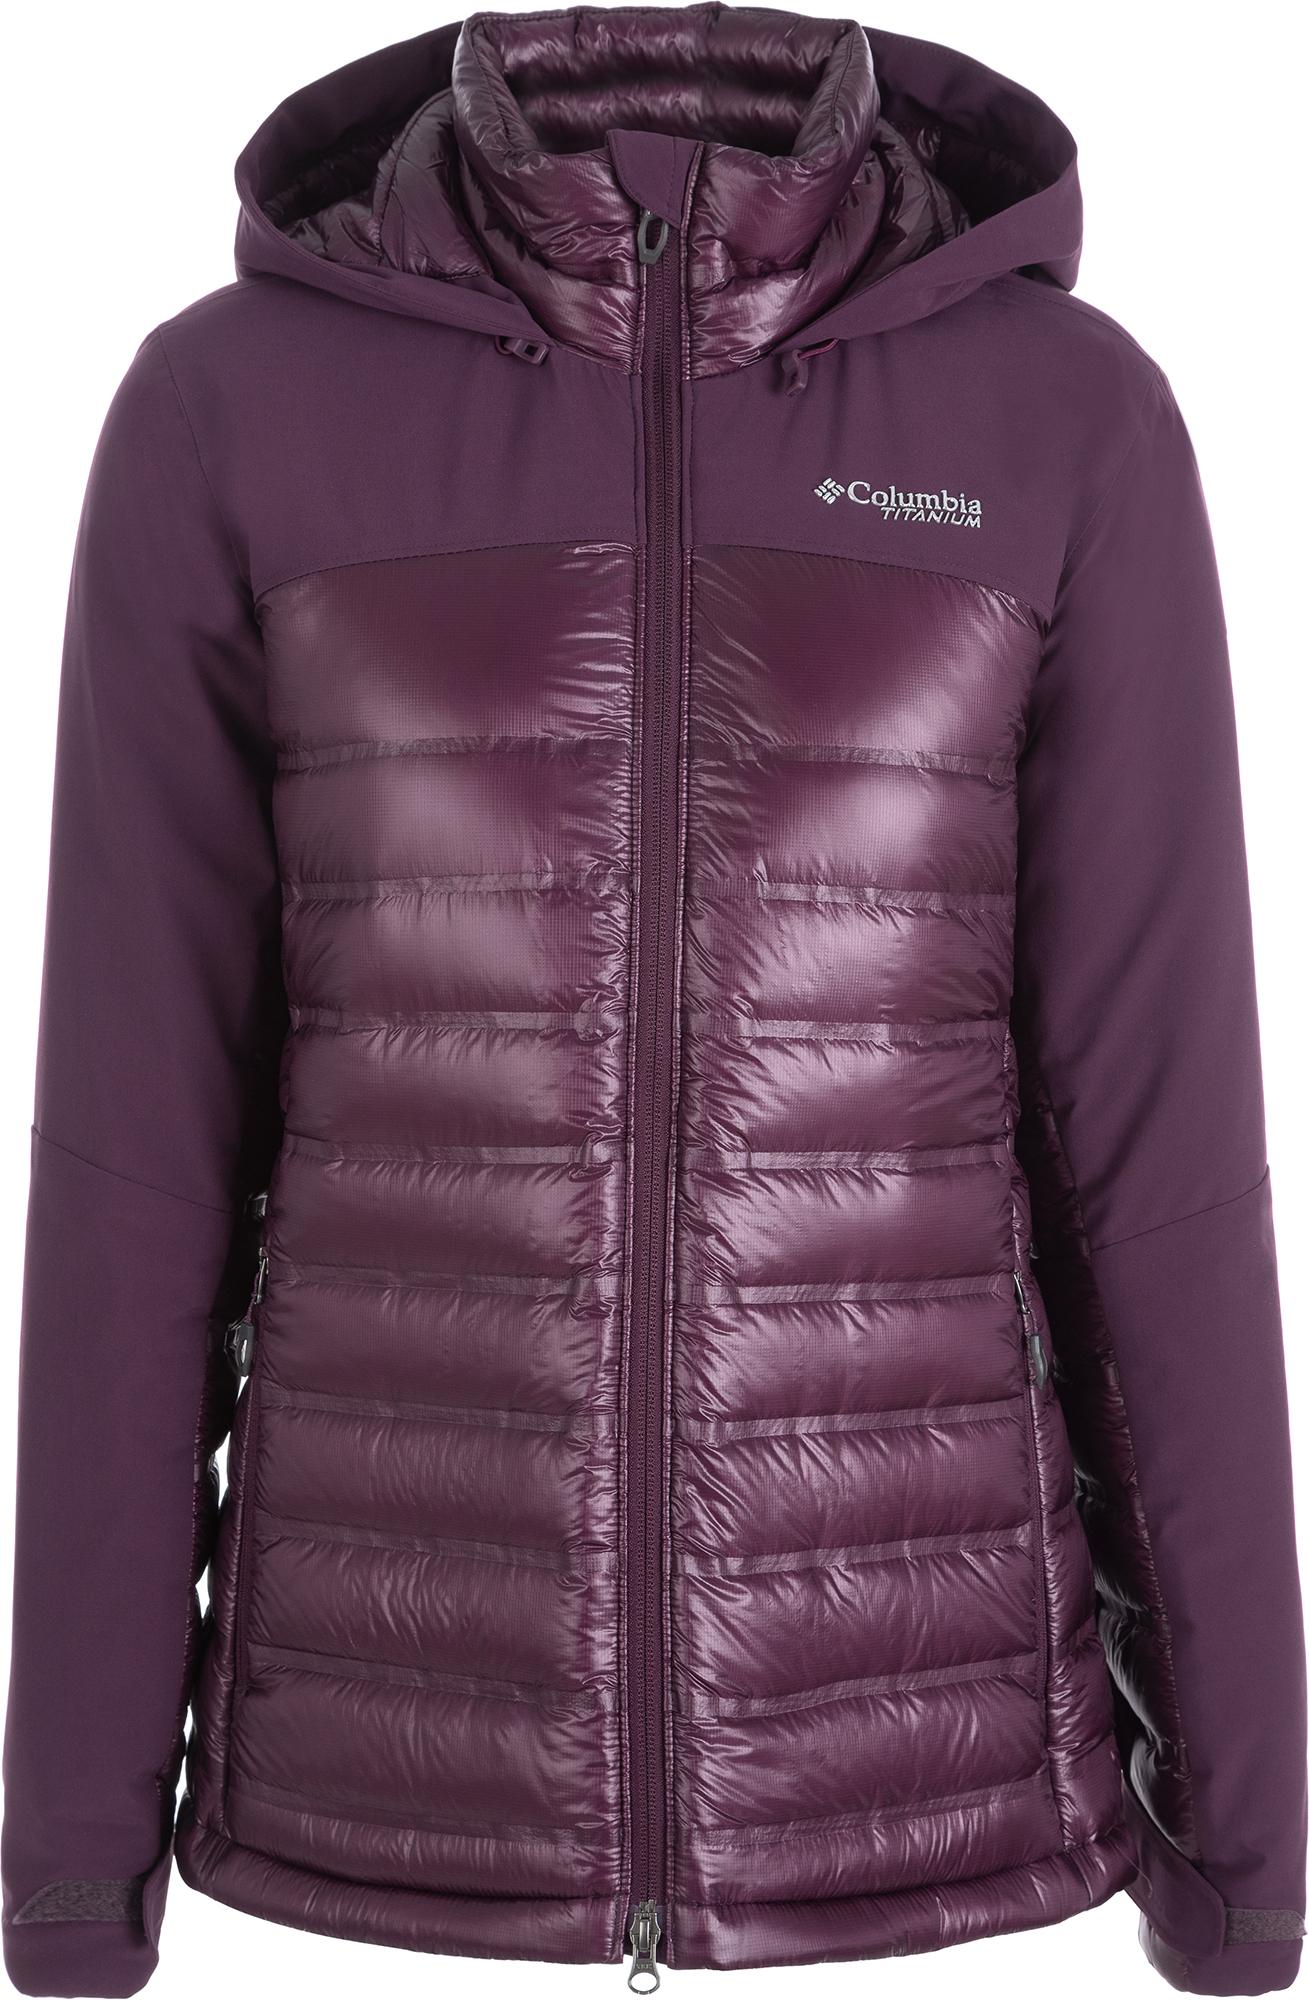 цена Columbia Куртка пуховая женская Columbia Heatzone 1000 TurboDown II, размер 44 онлайн в 2017 году